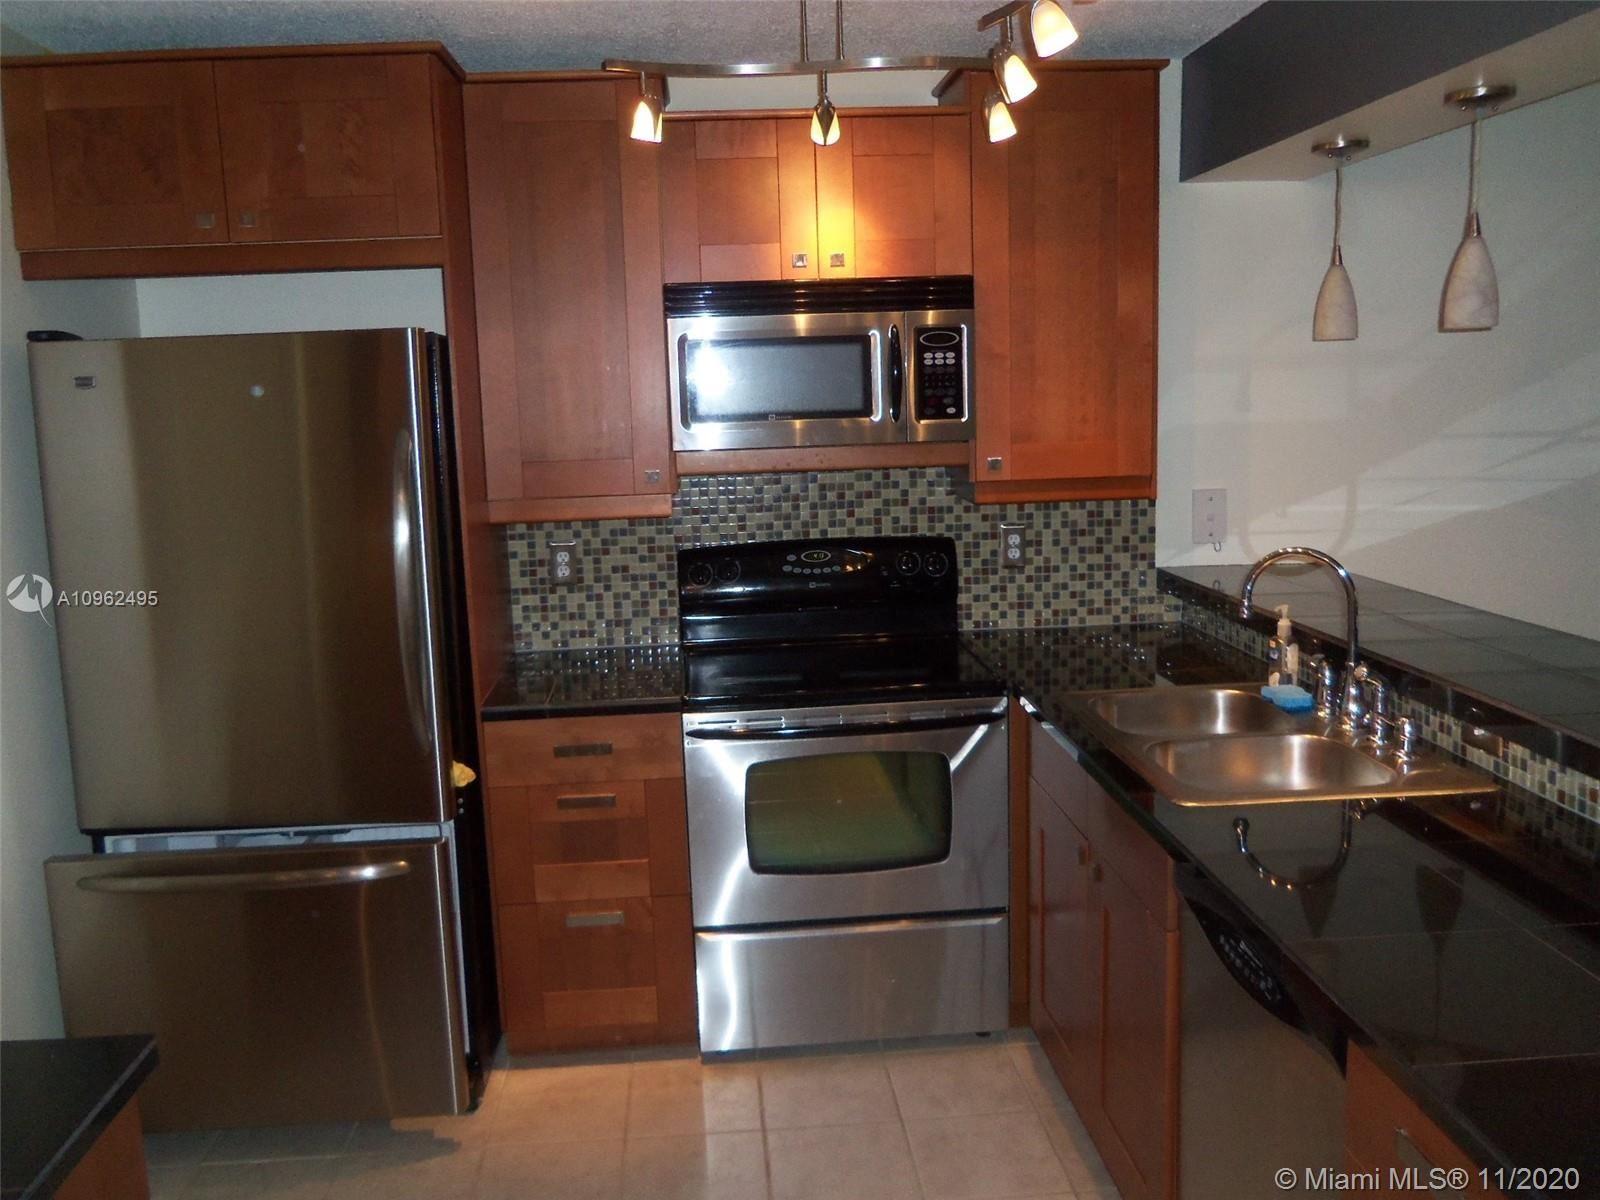 Photo of 10551 W Broward Blvd #209, Plantation, FL 33324 (MLS # A10962495)